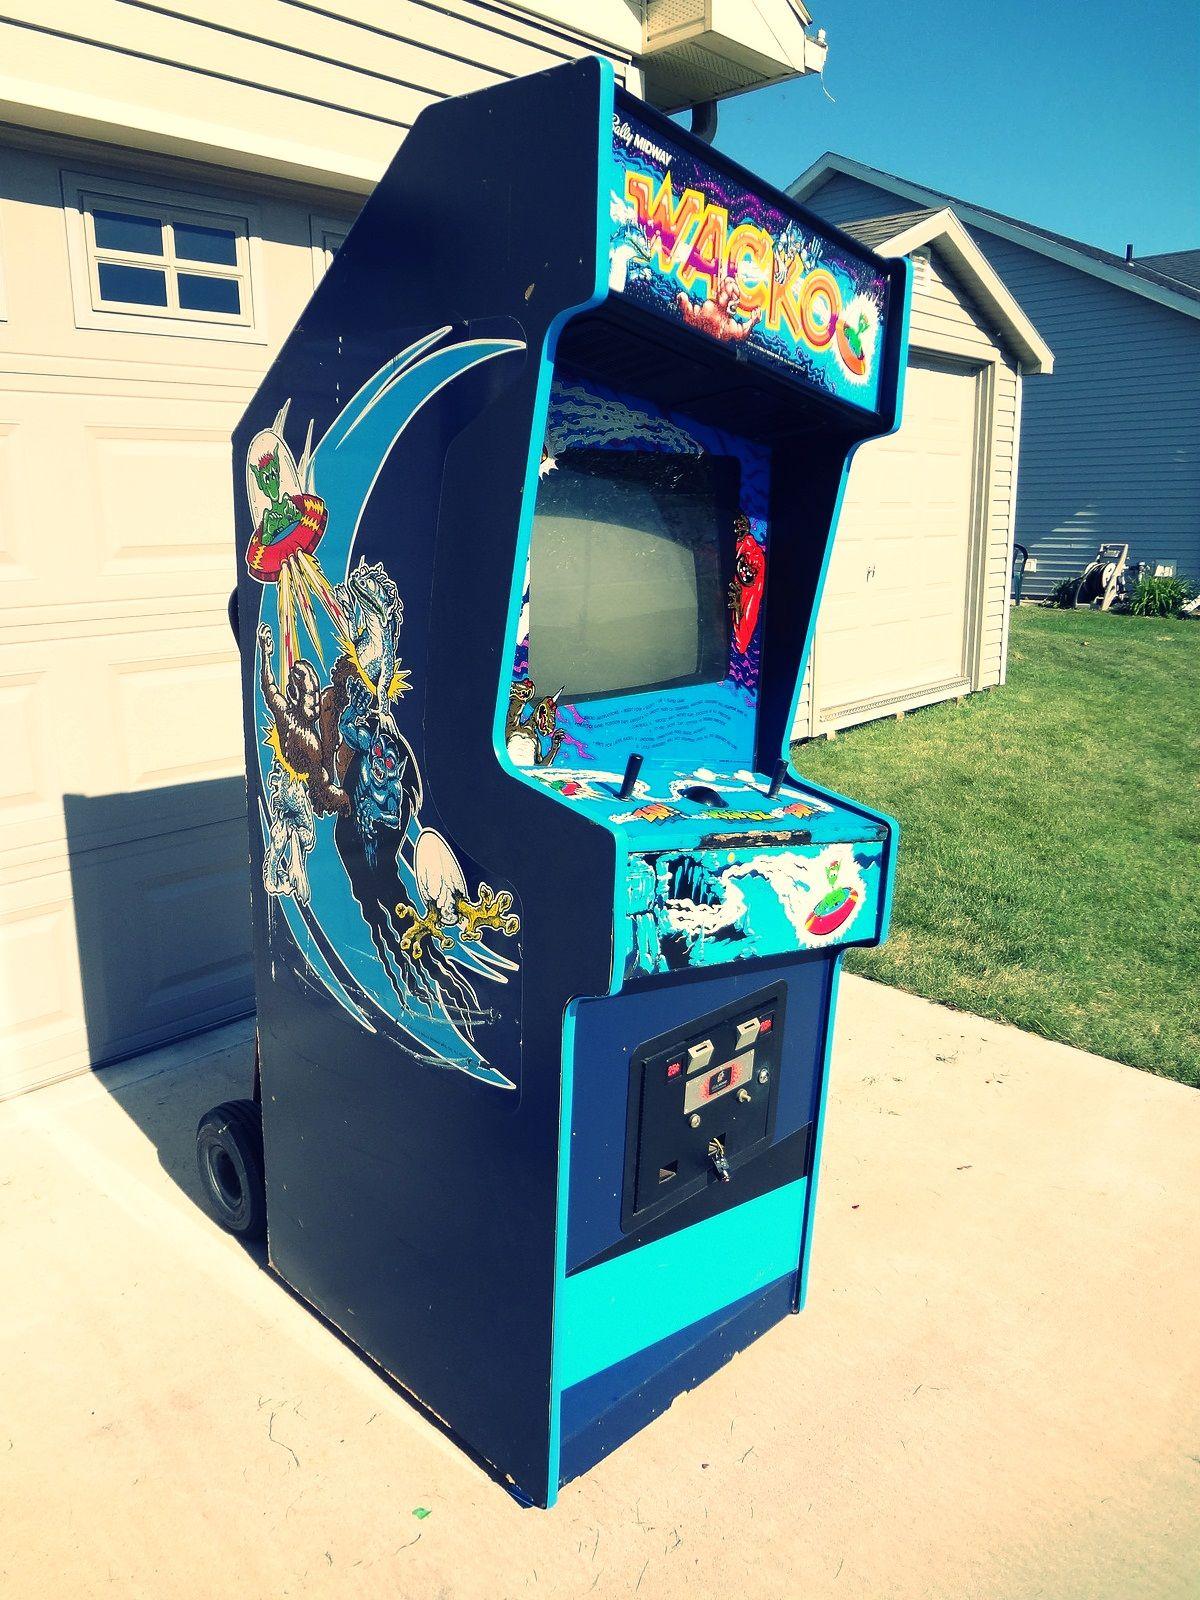 Wacko Arcade Game (1983) retrogaming arcade